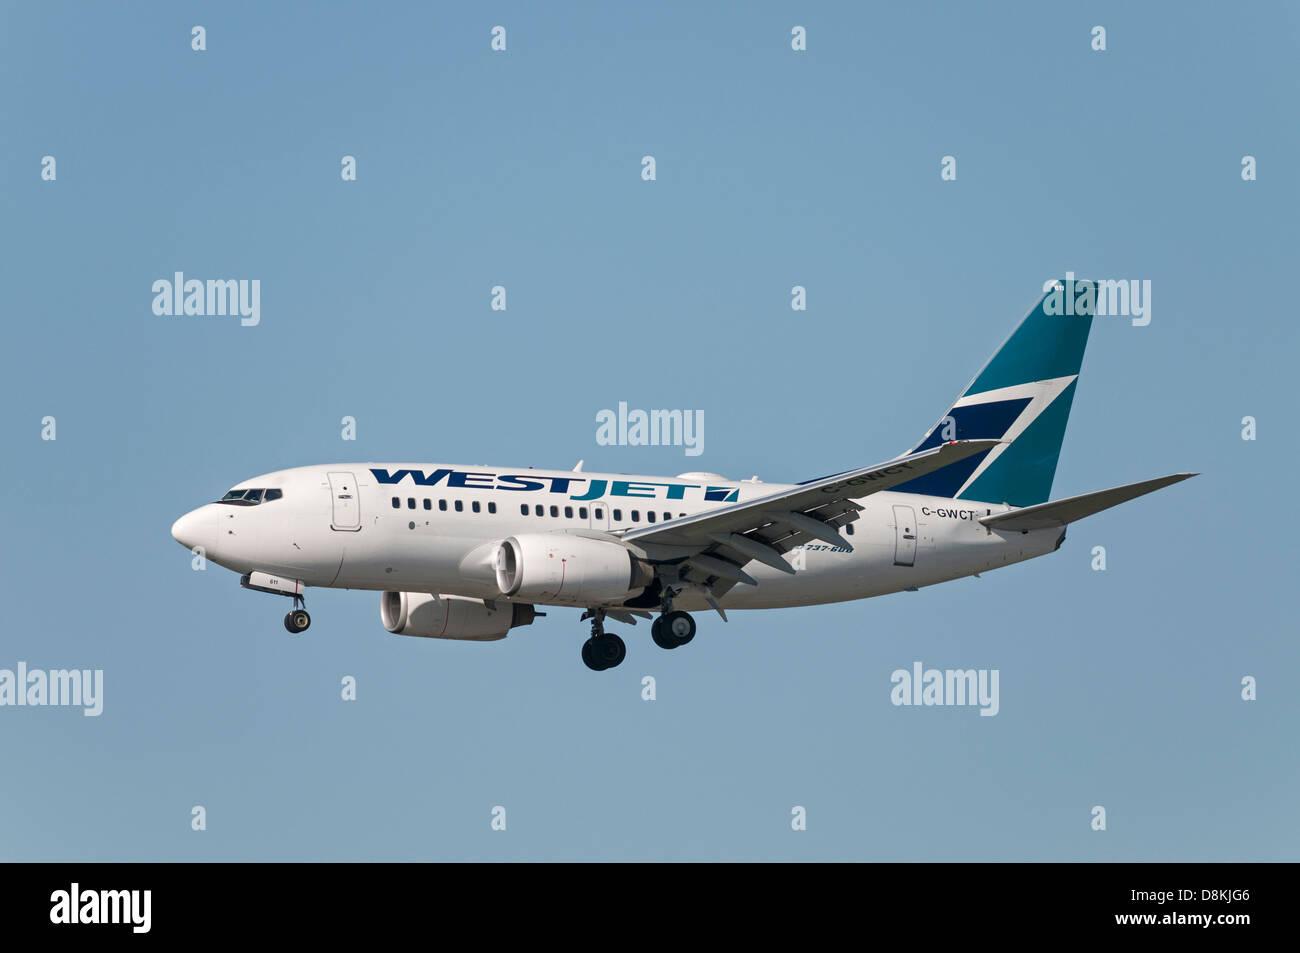 Westjet Boeing 737 passenger jetliner on final approach for landing. - Stock Image